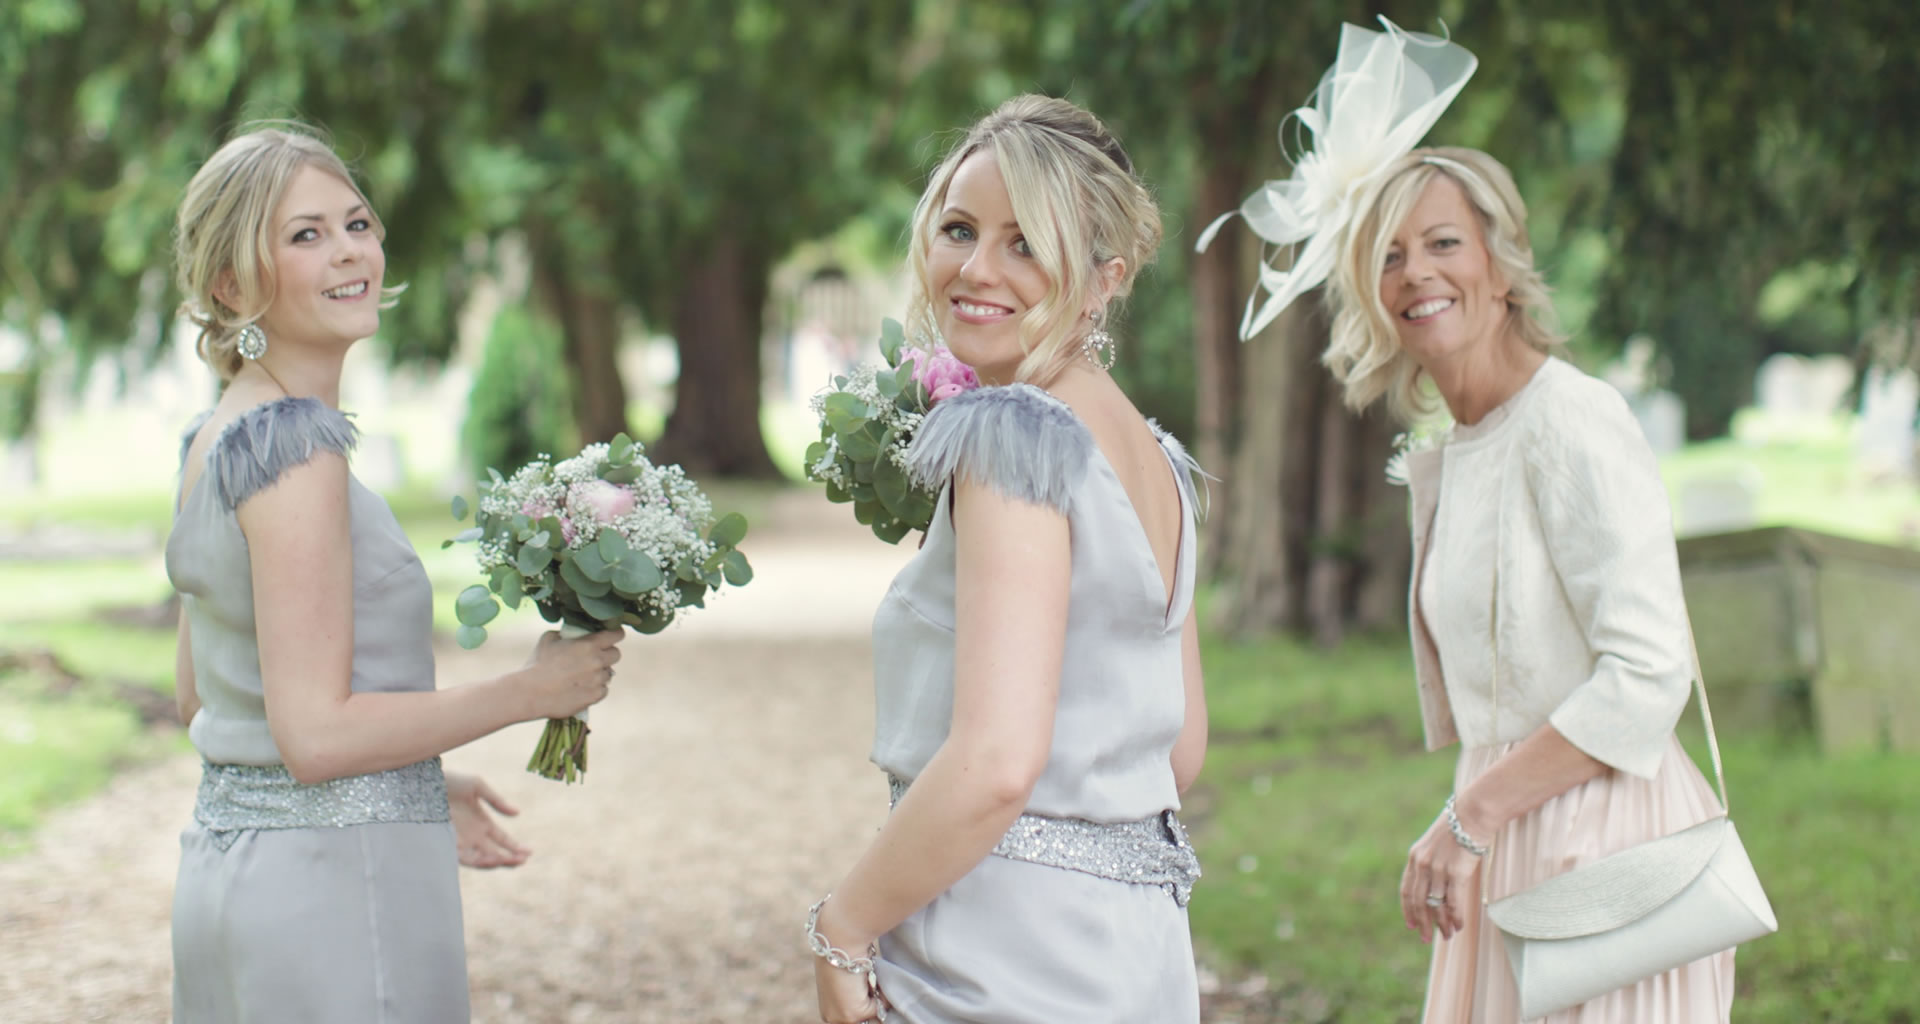 bridemaids. photography by www.bullitphotography.co.uk